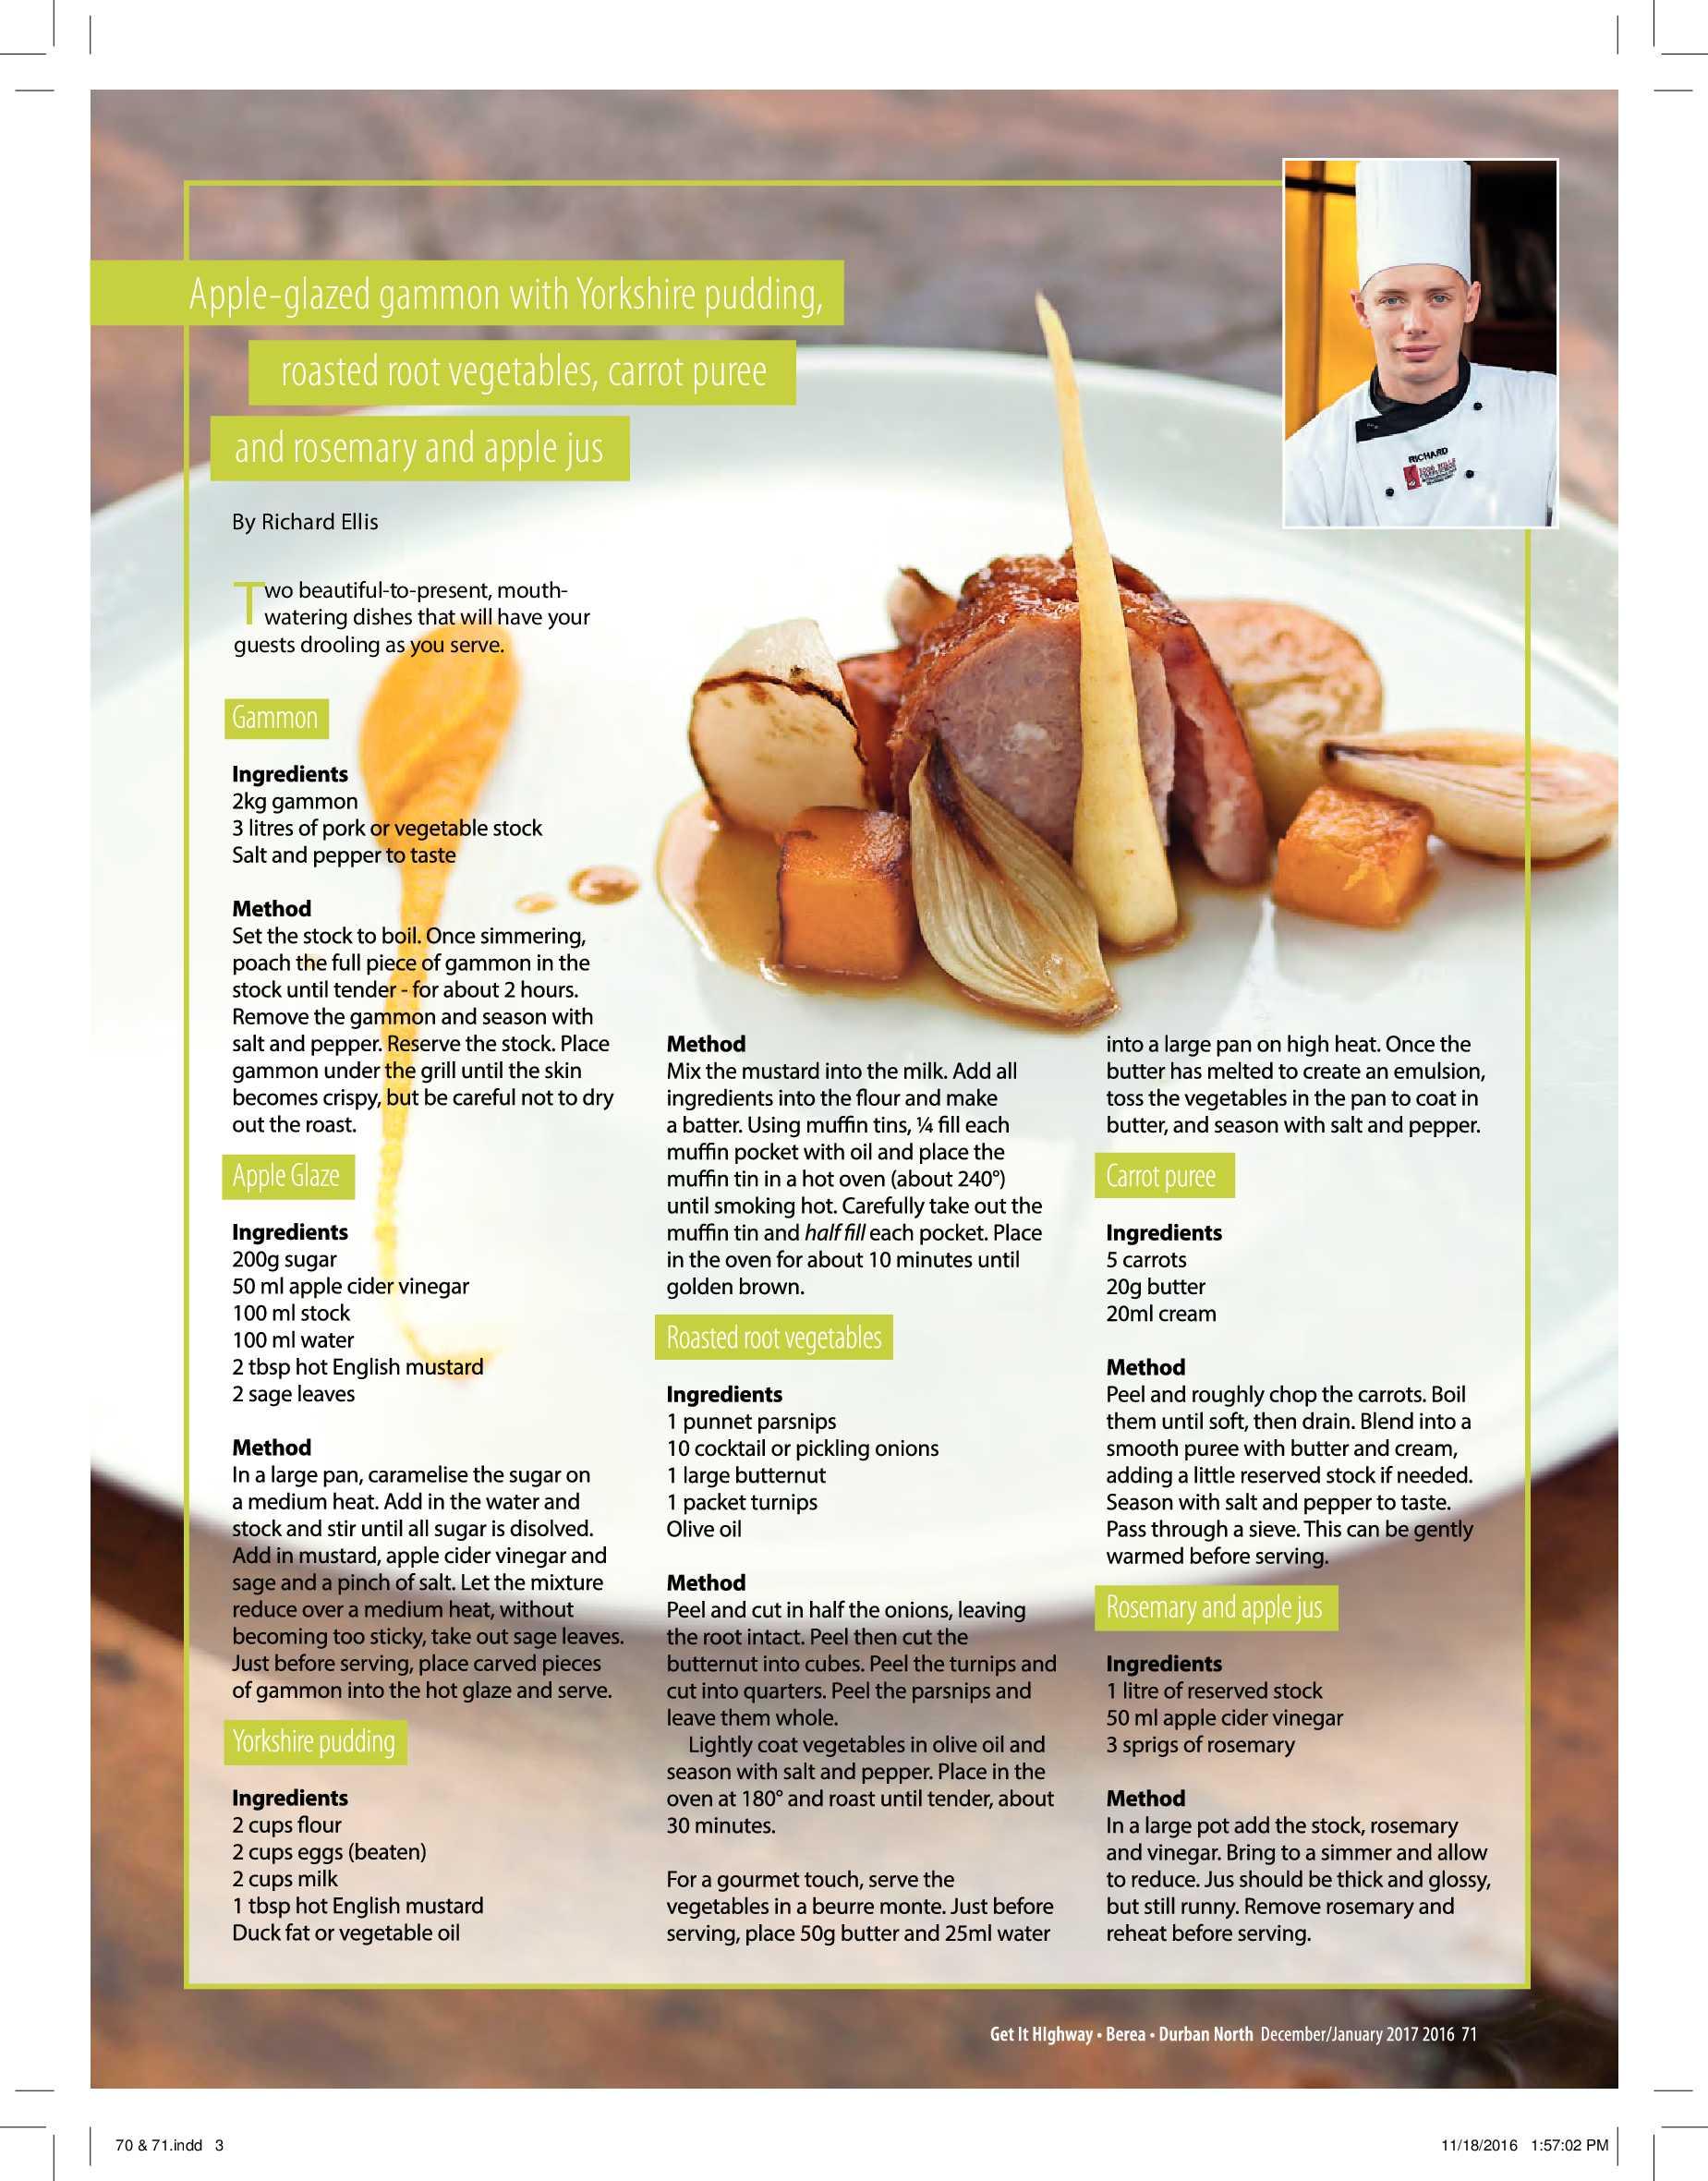 durban-get-it-magazine-december-2016-epapers-page-73